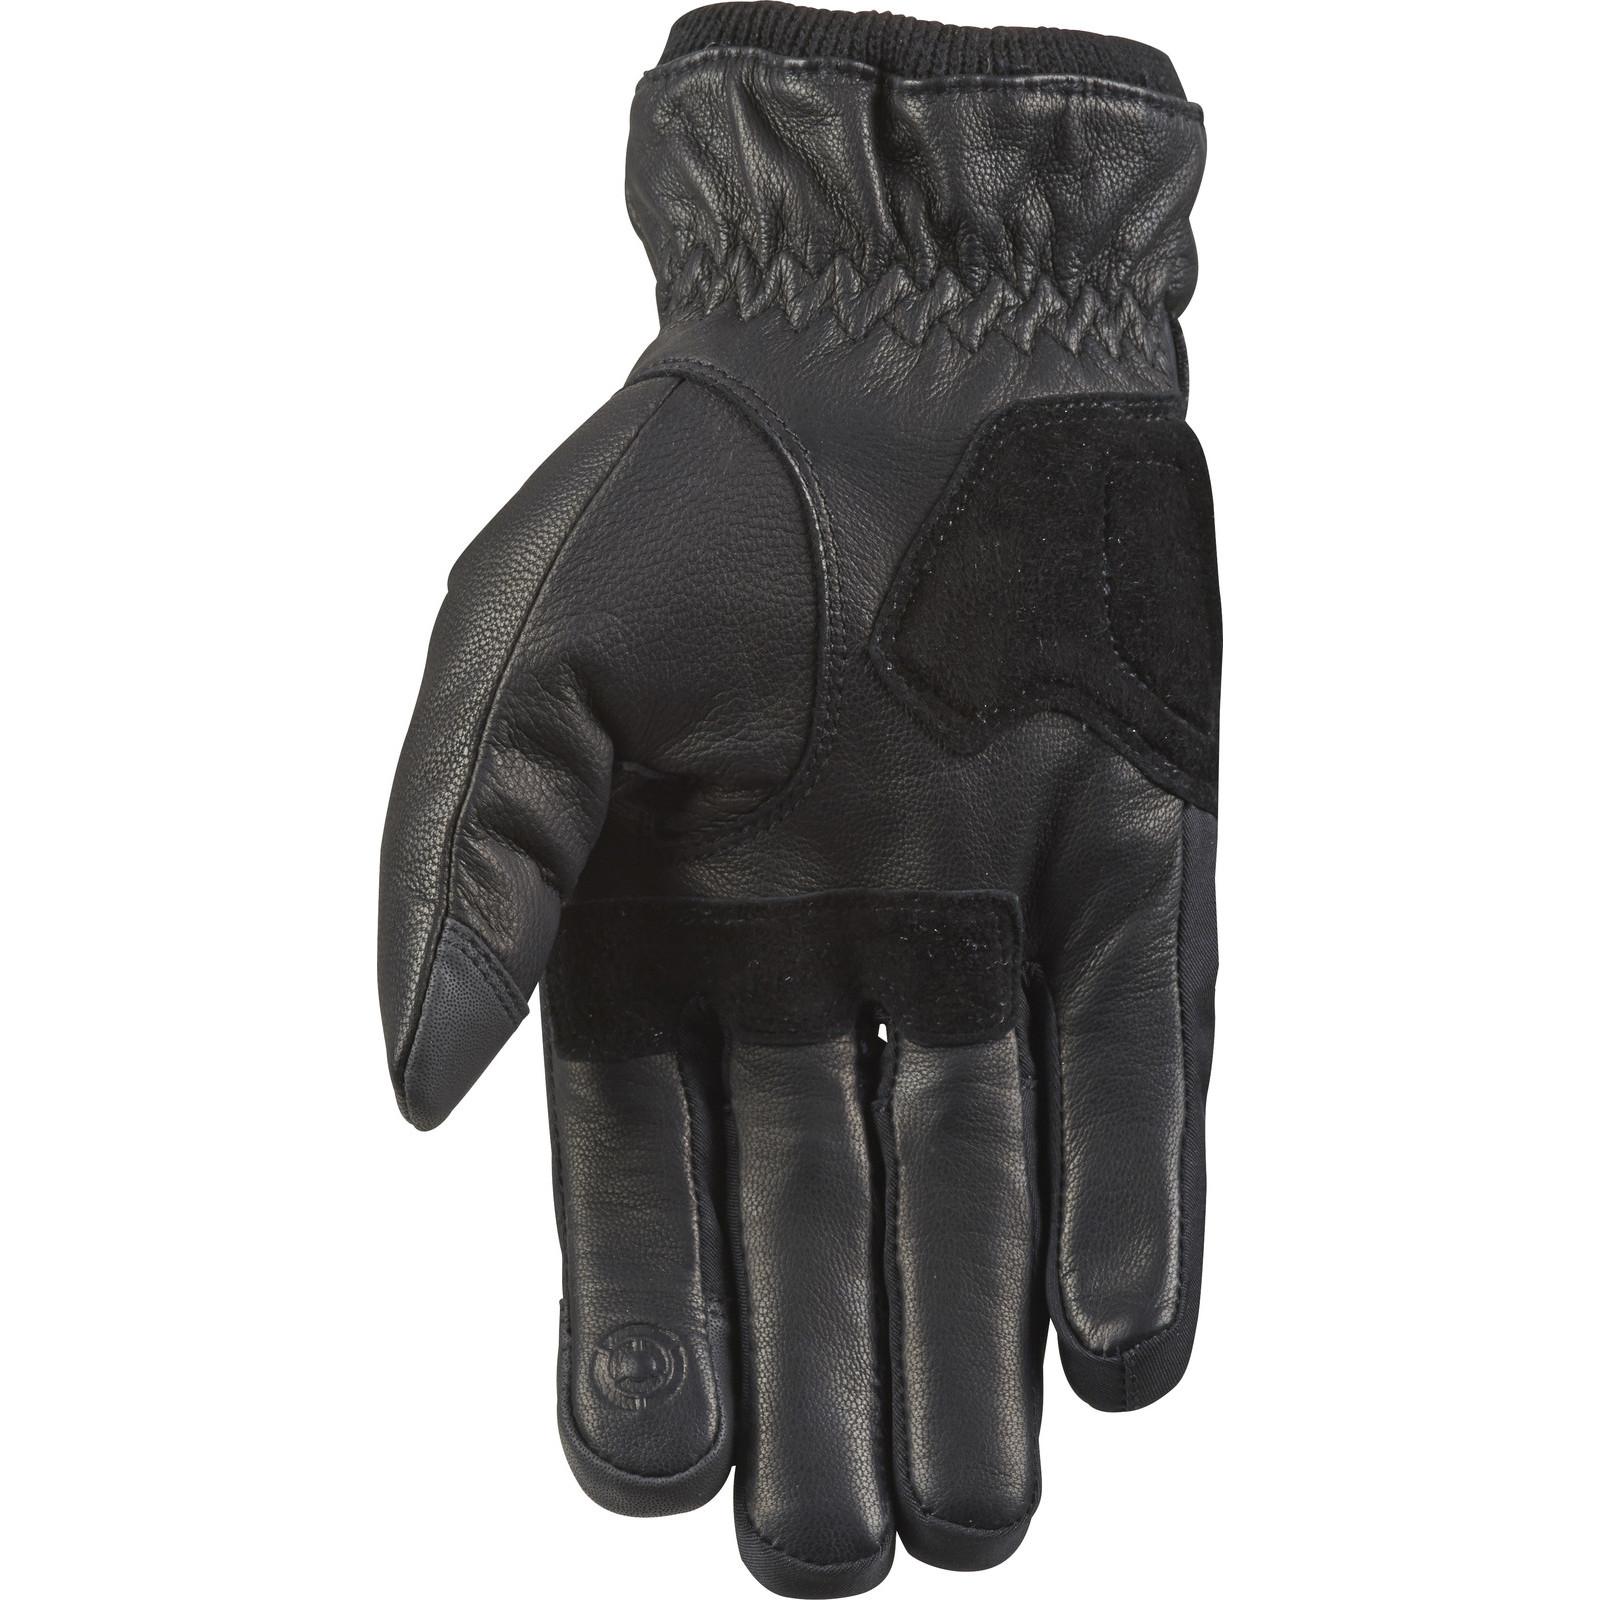 Motorcycle knuckle gloves - Furygan Midland Motorcycle Gloves Motorbike Waterproof Leather Knuckle